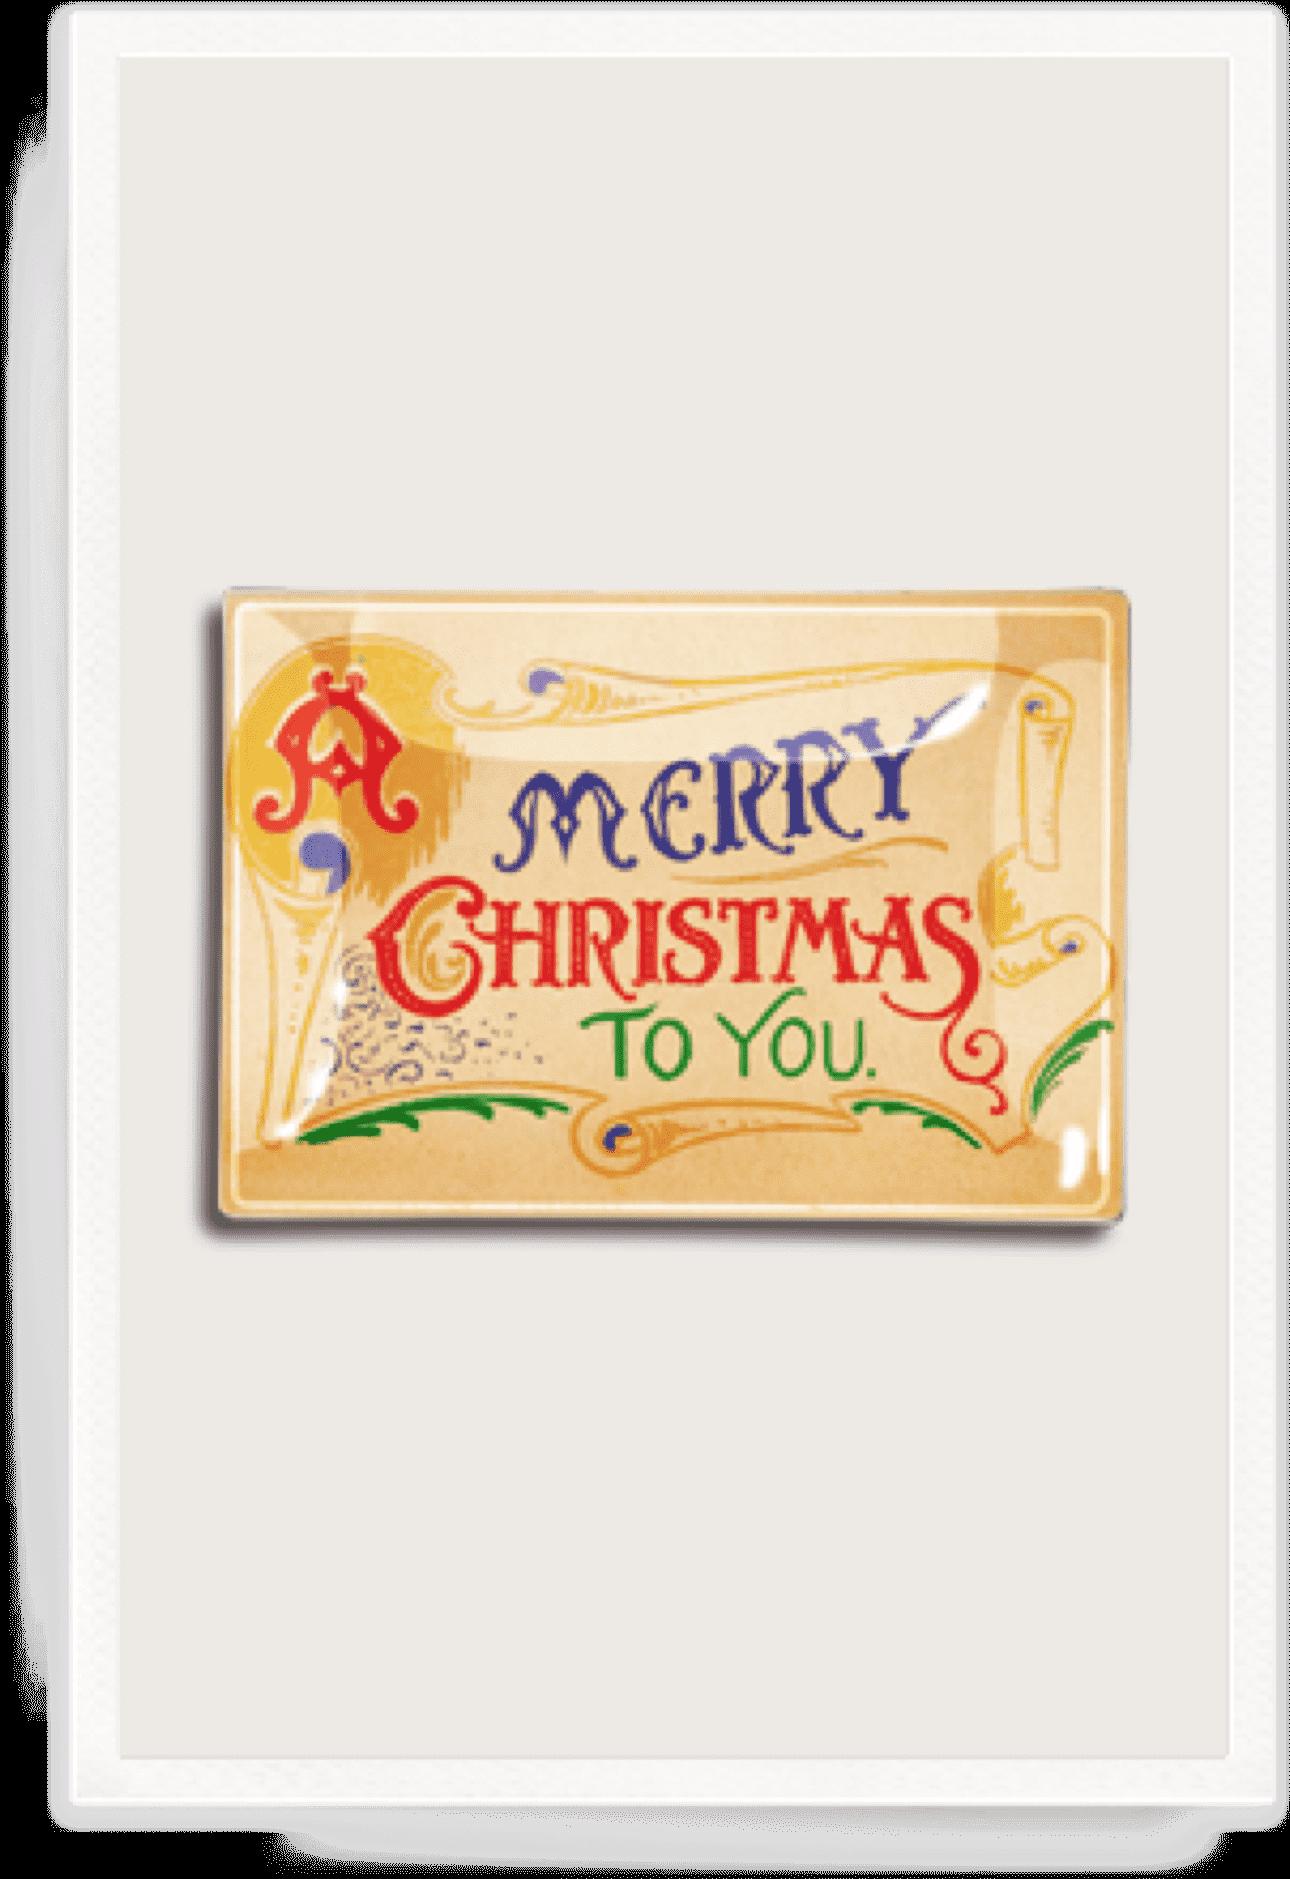 Transparent vintage merry christmas clipart - Ben's Garden - Calligraphy